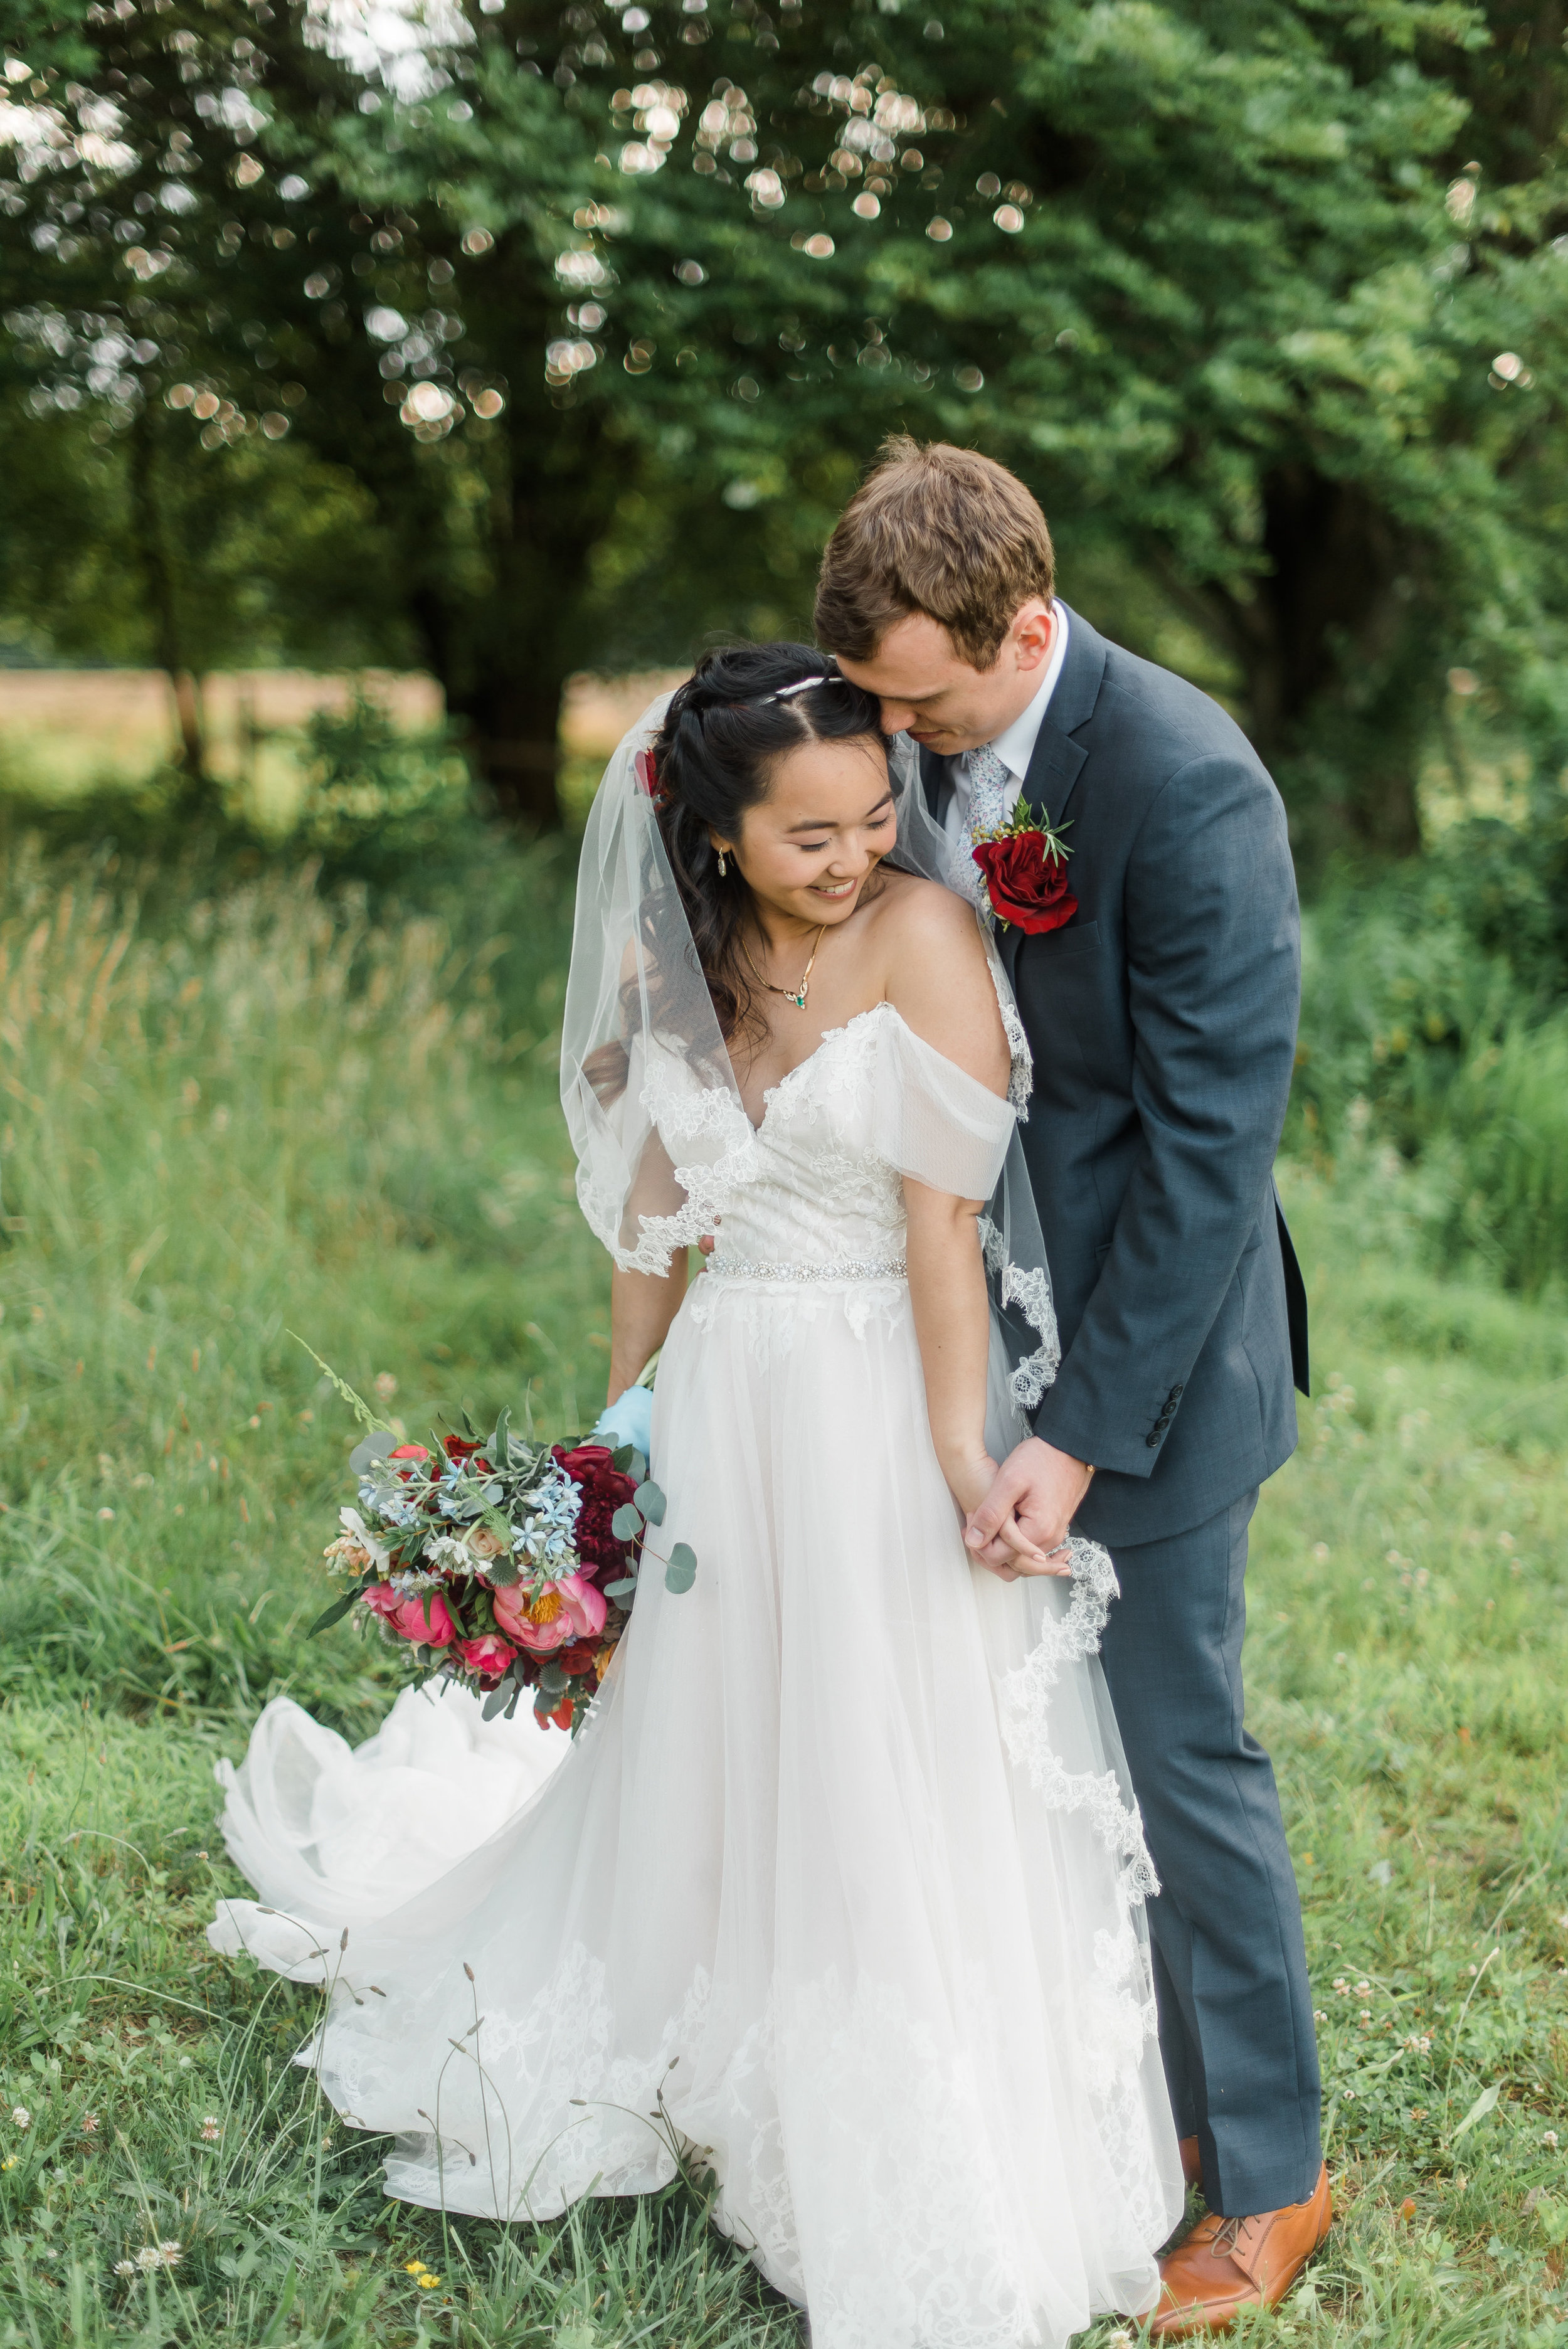 pittsburgh-wedding-photographer-rustic-acres-farm-summer-boho-wedding0014.jpg